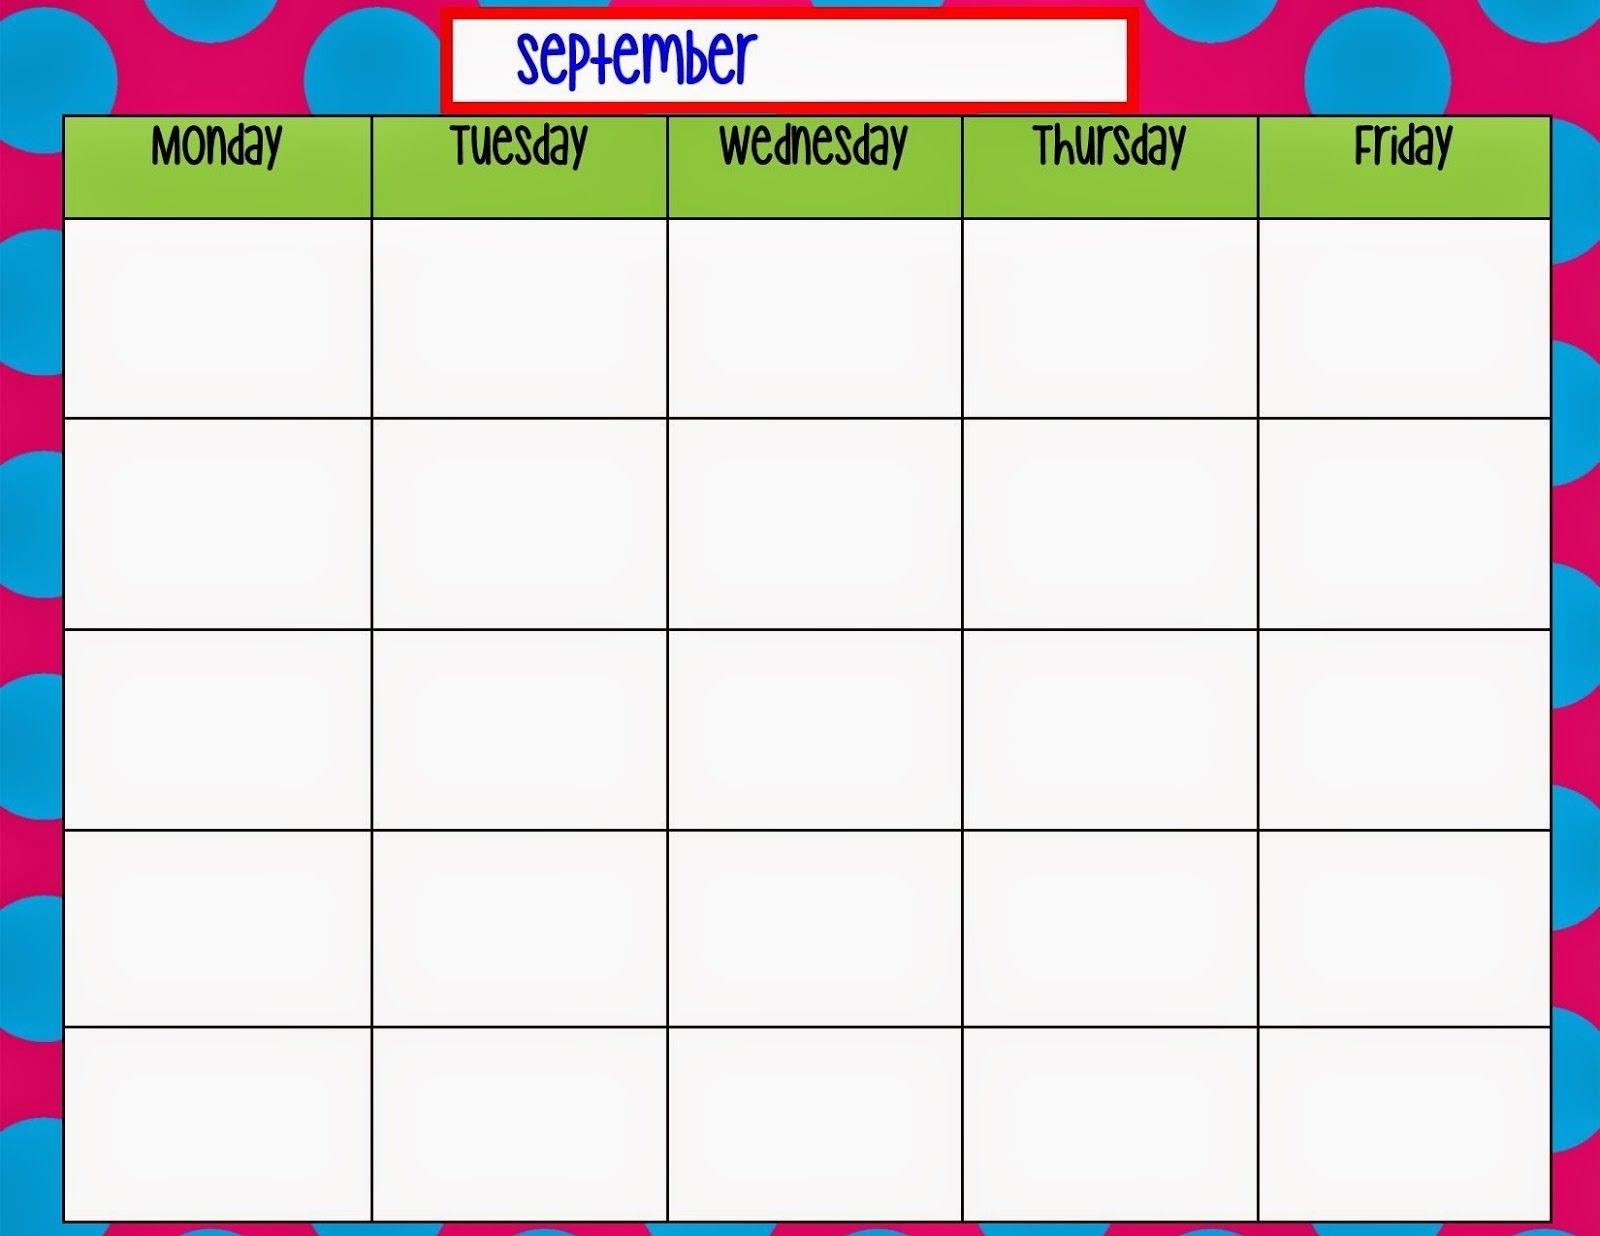 Monday Through Friday Calendar Template | Preschool | Printable in Blank Weekly Calendar Monday To Friday